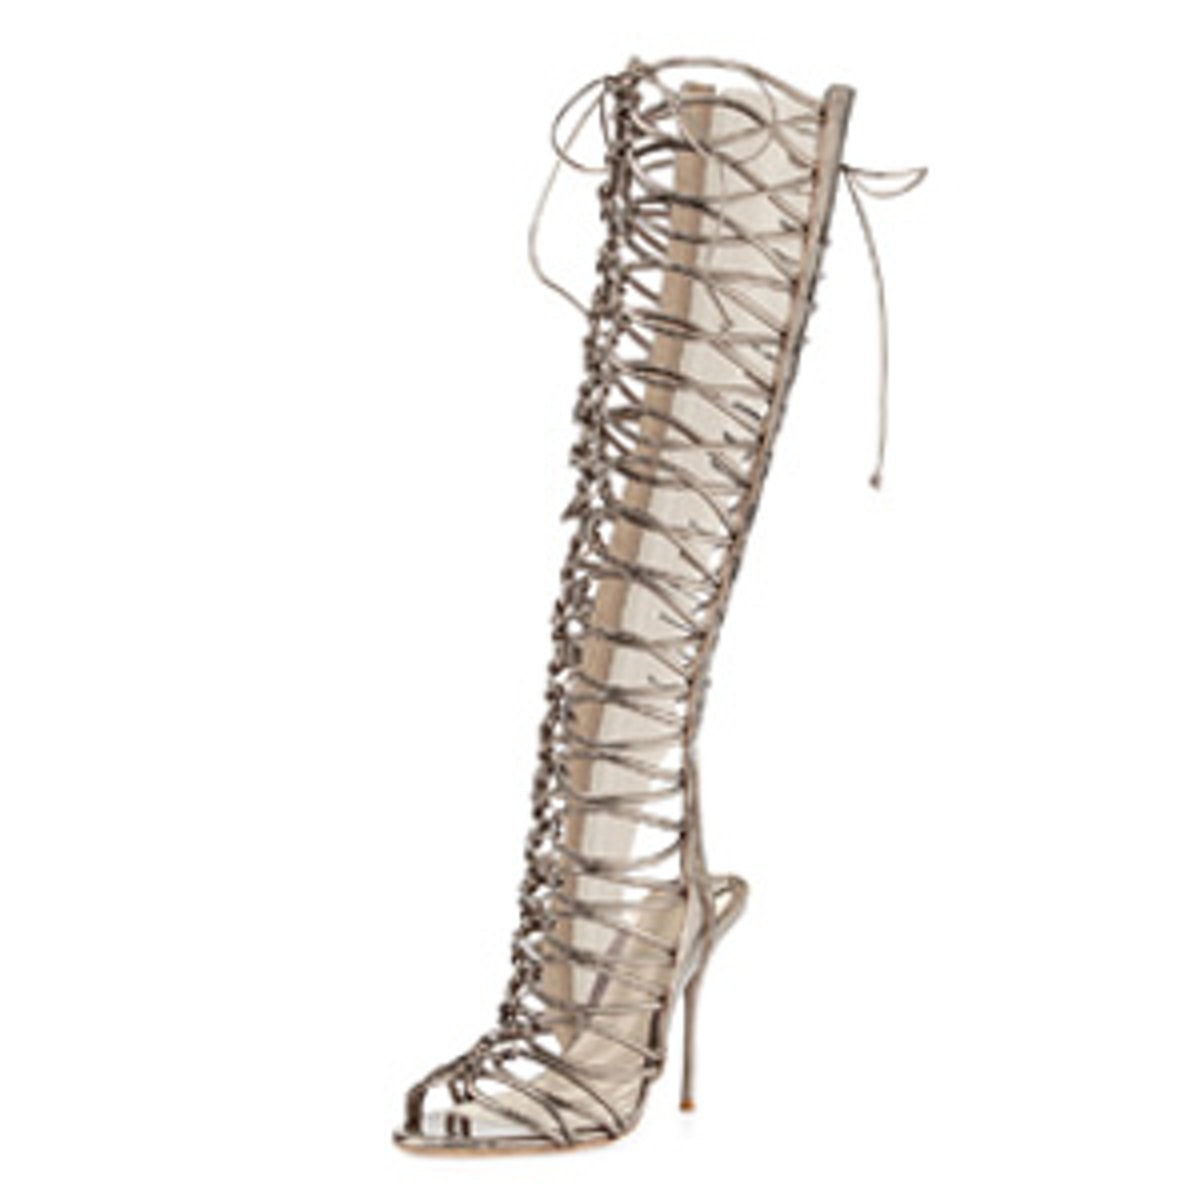 Clementine Gladiator Sandal Boot